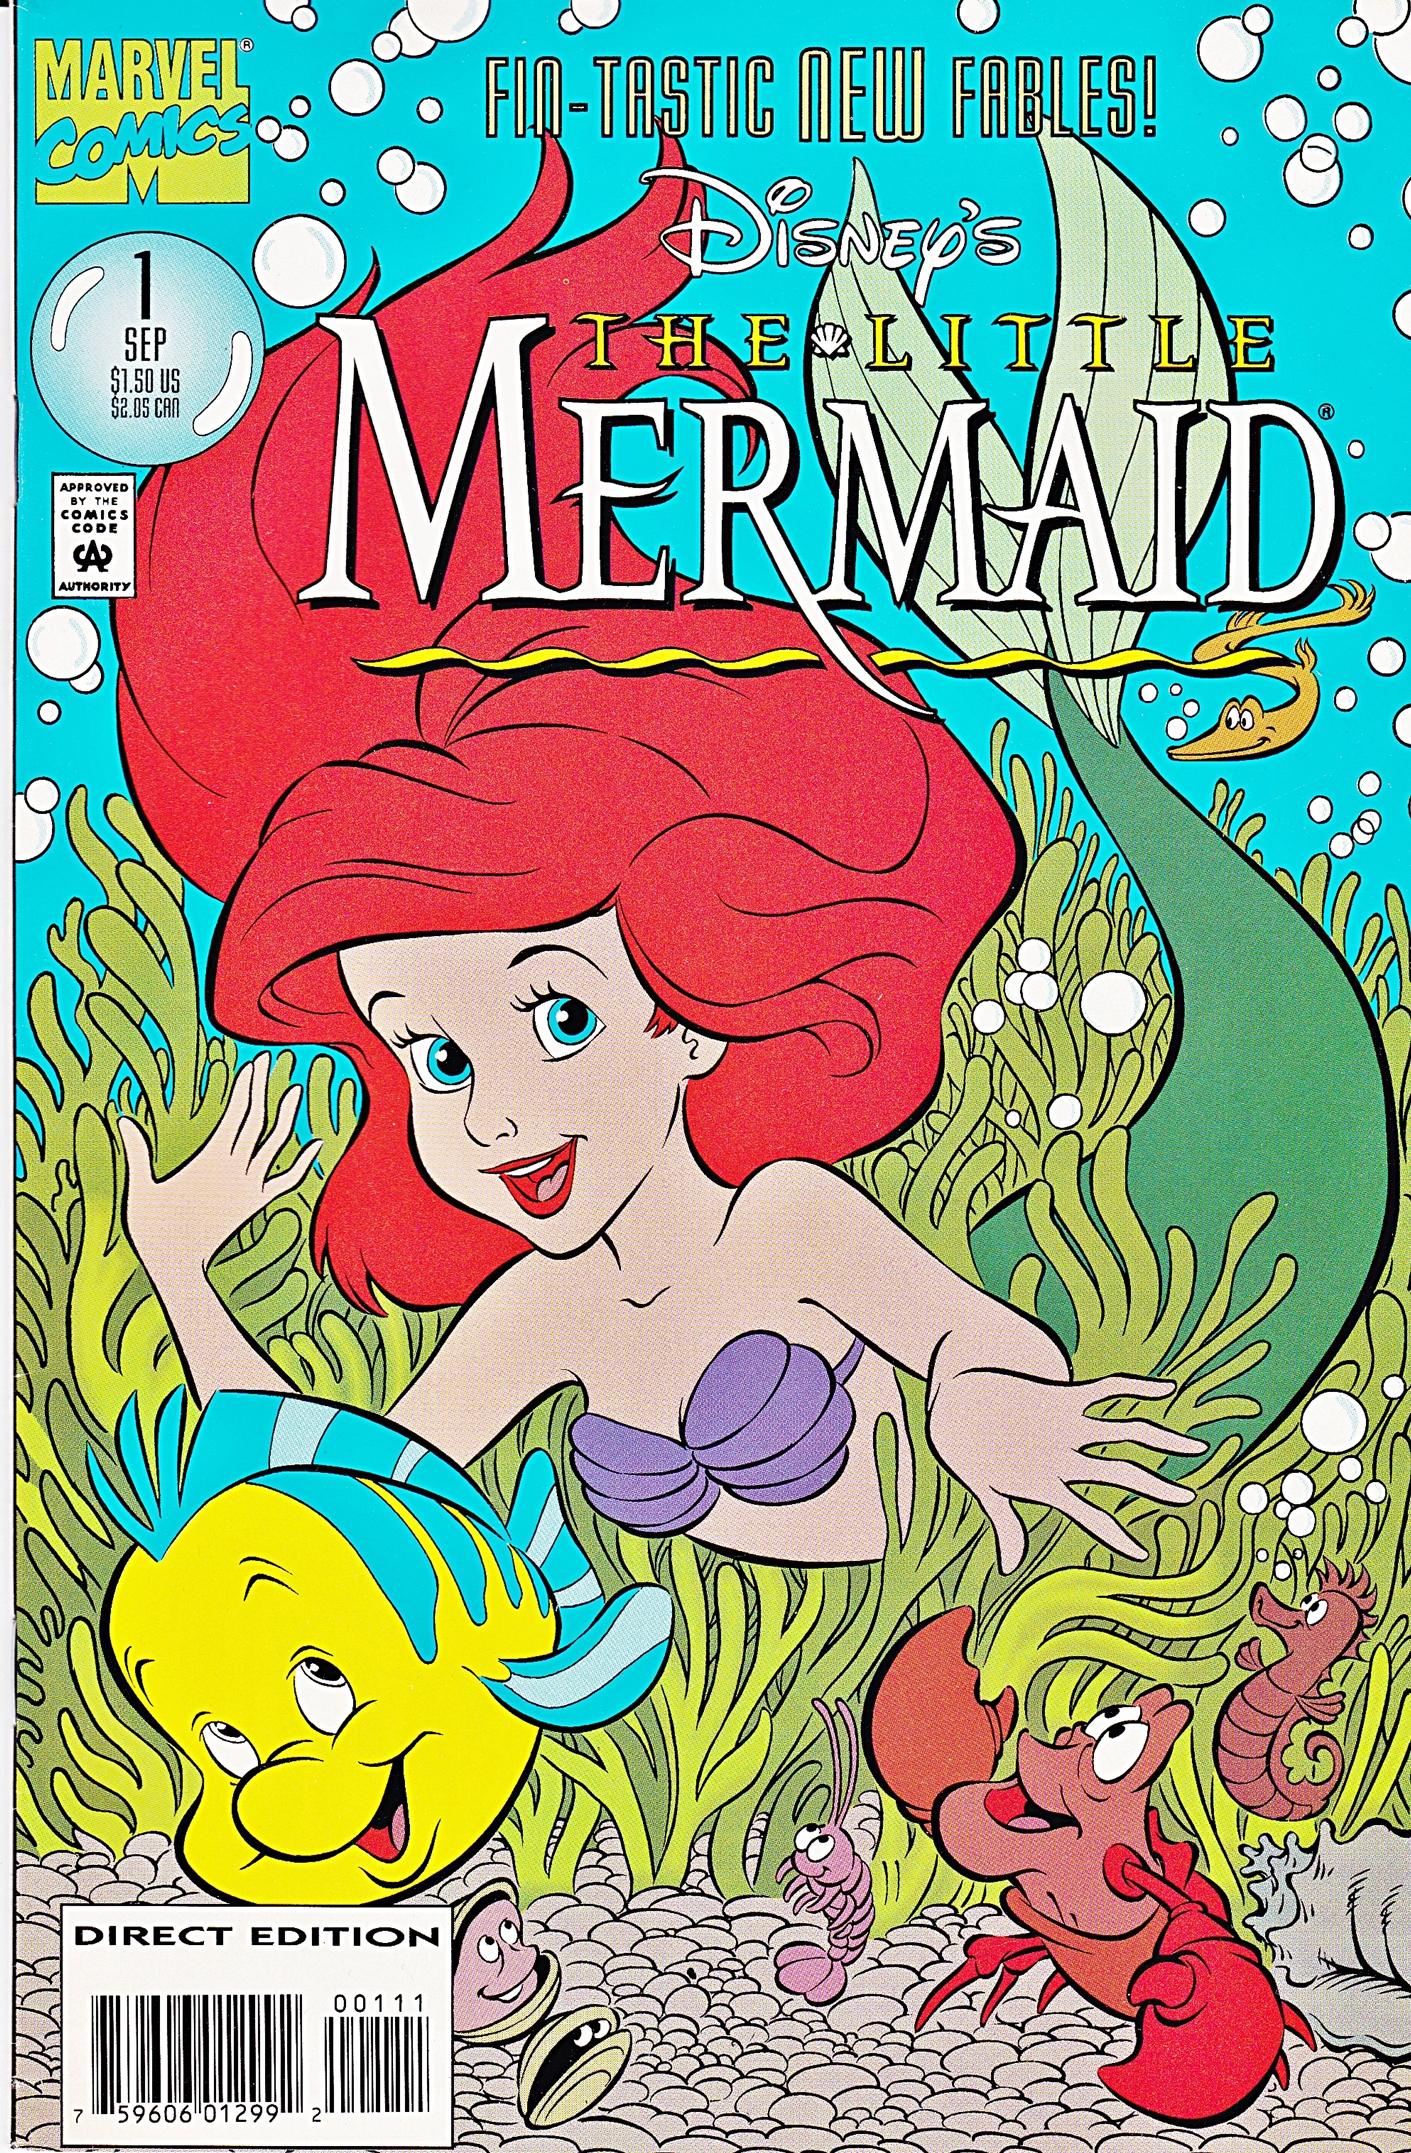 The Little Mermaid (Marvel Comics) | Disney Wiki | FANDOM ... - photo#29